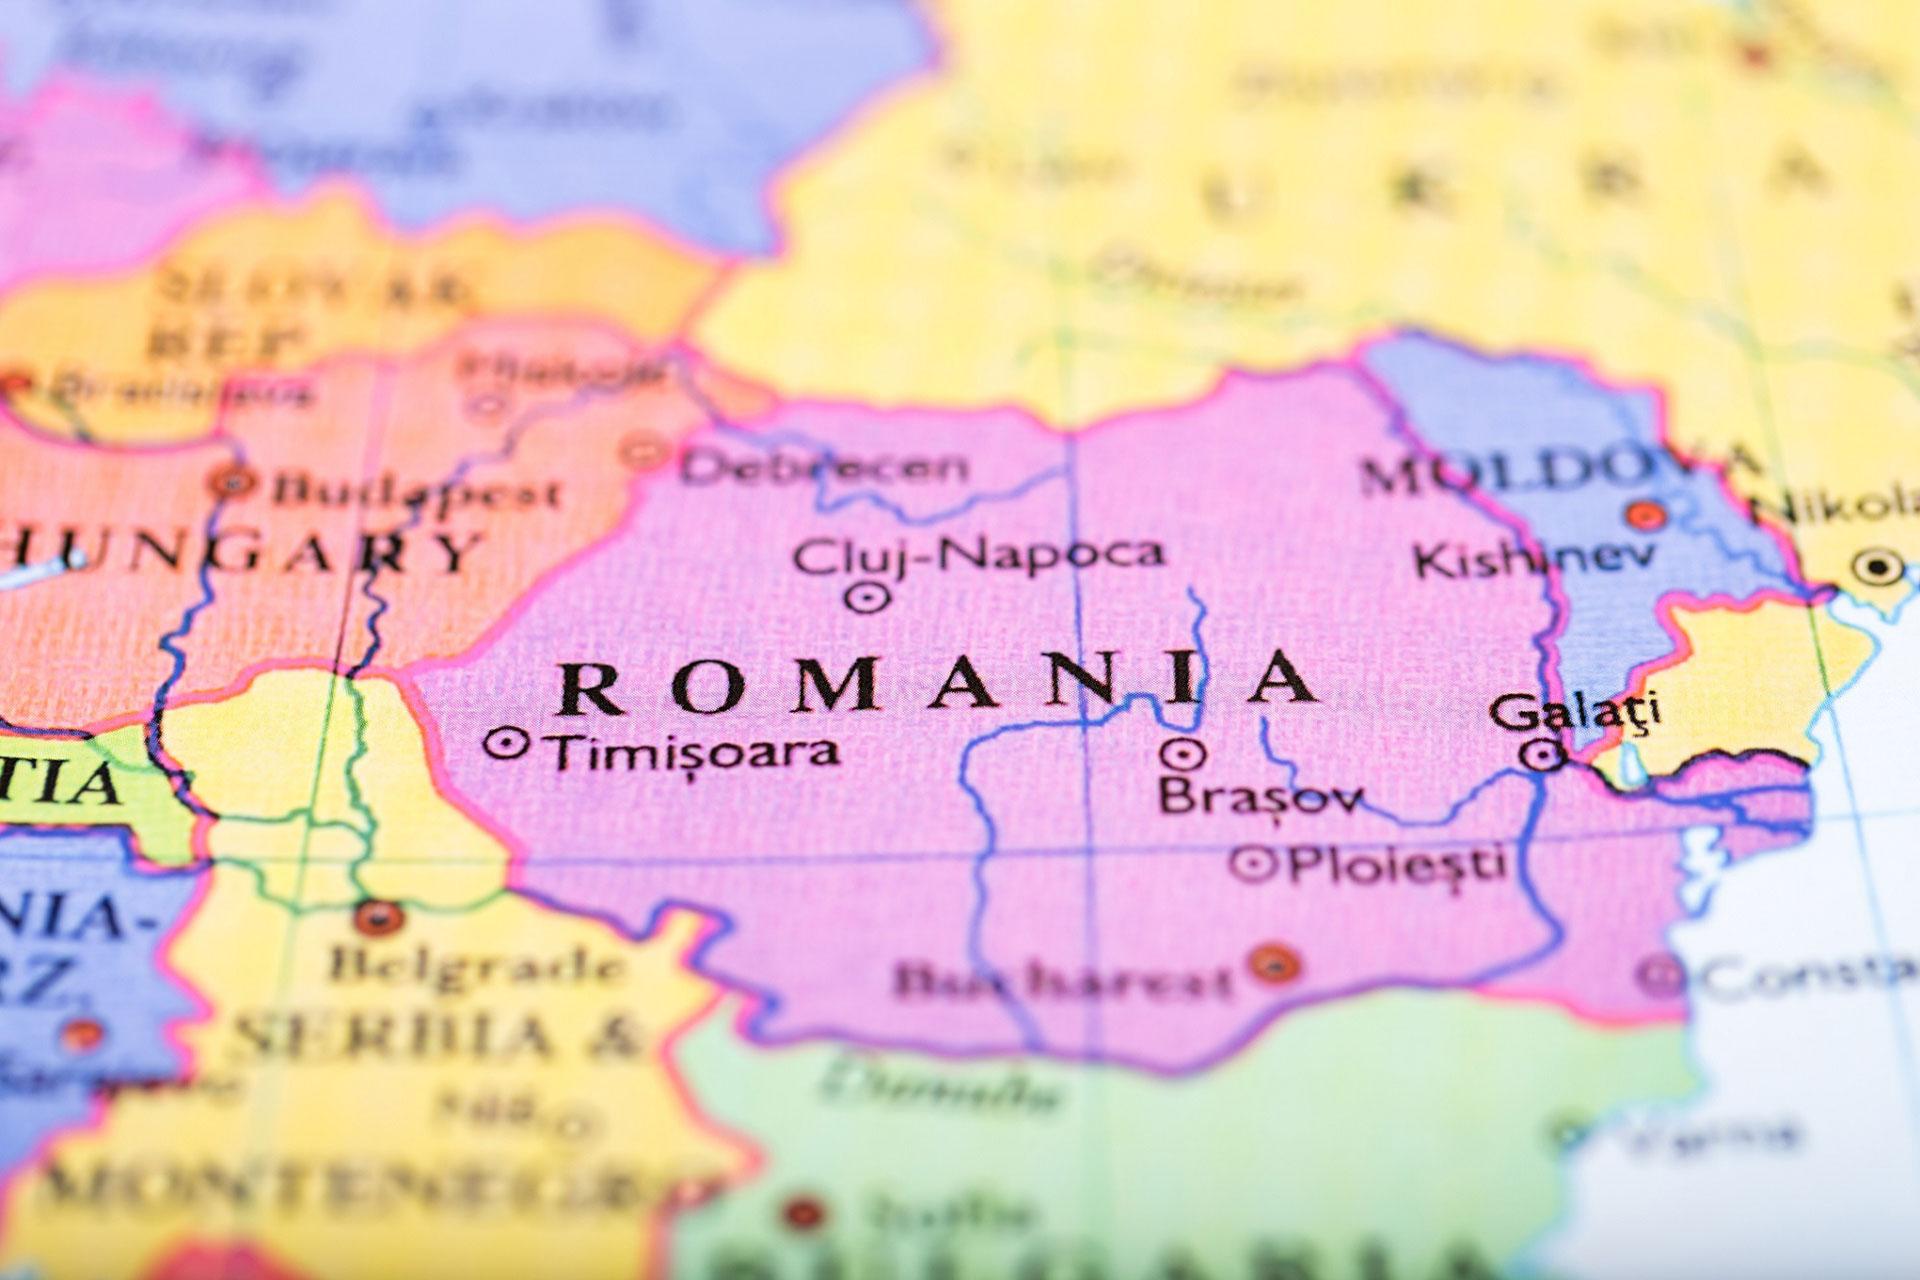 Romania map 001 1920x1280 v4